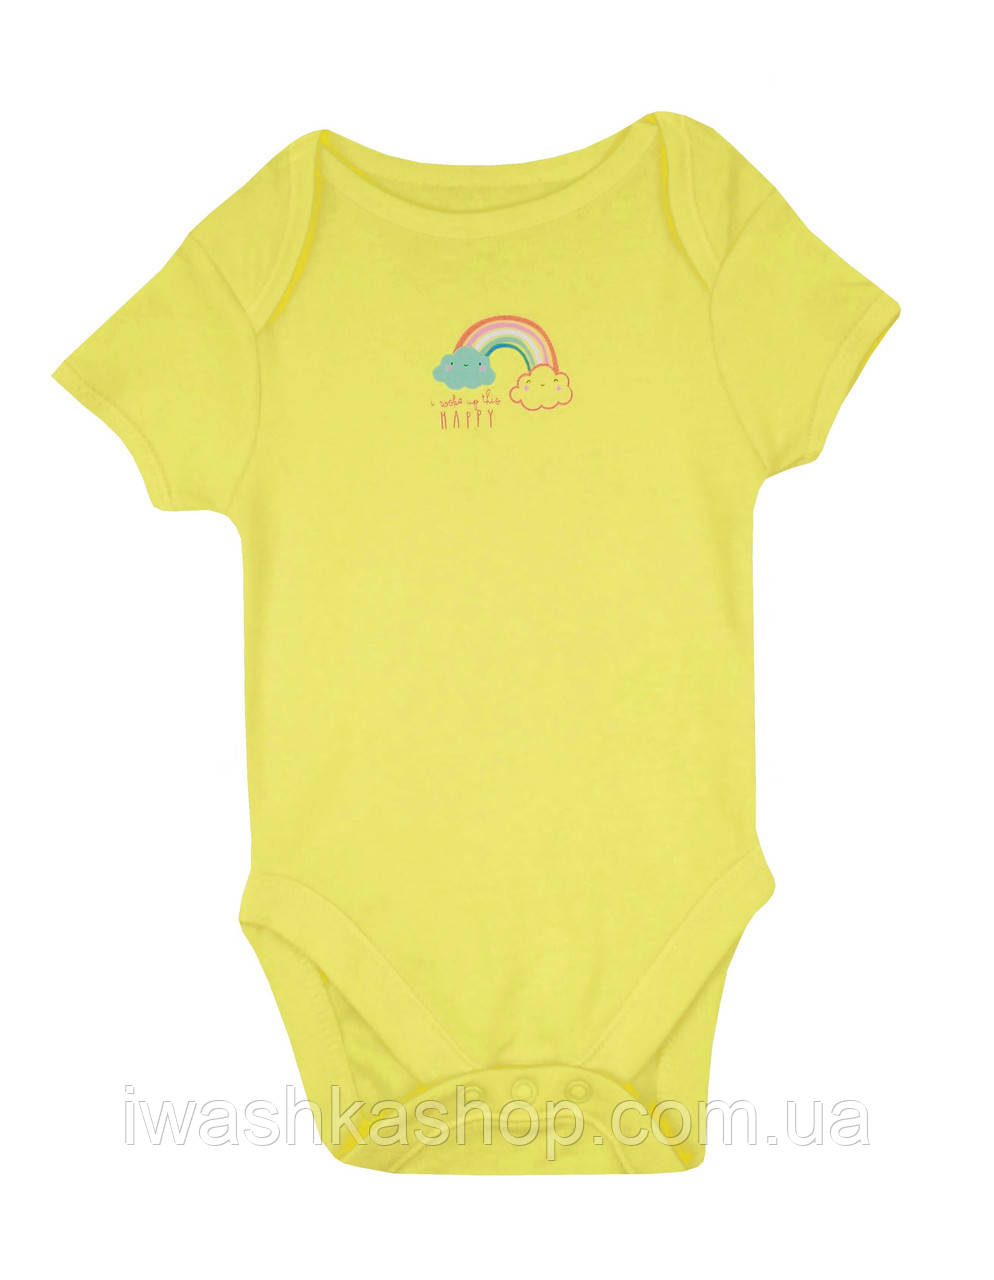 Яркое желтое боди с коротким рукавом для малышей 3 - 6 месяцев, р. 68, Early days by Primark, Германия